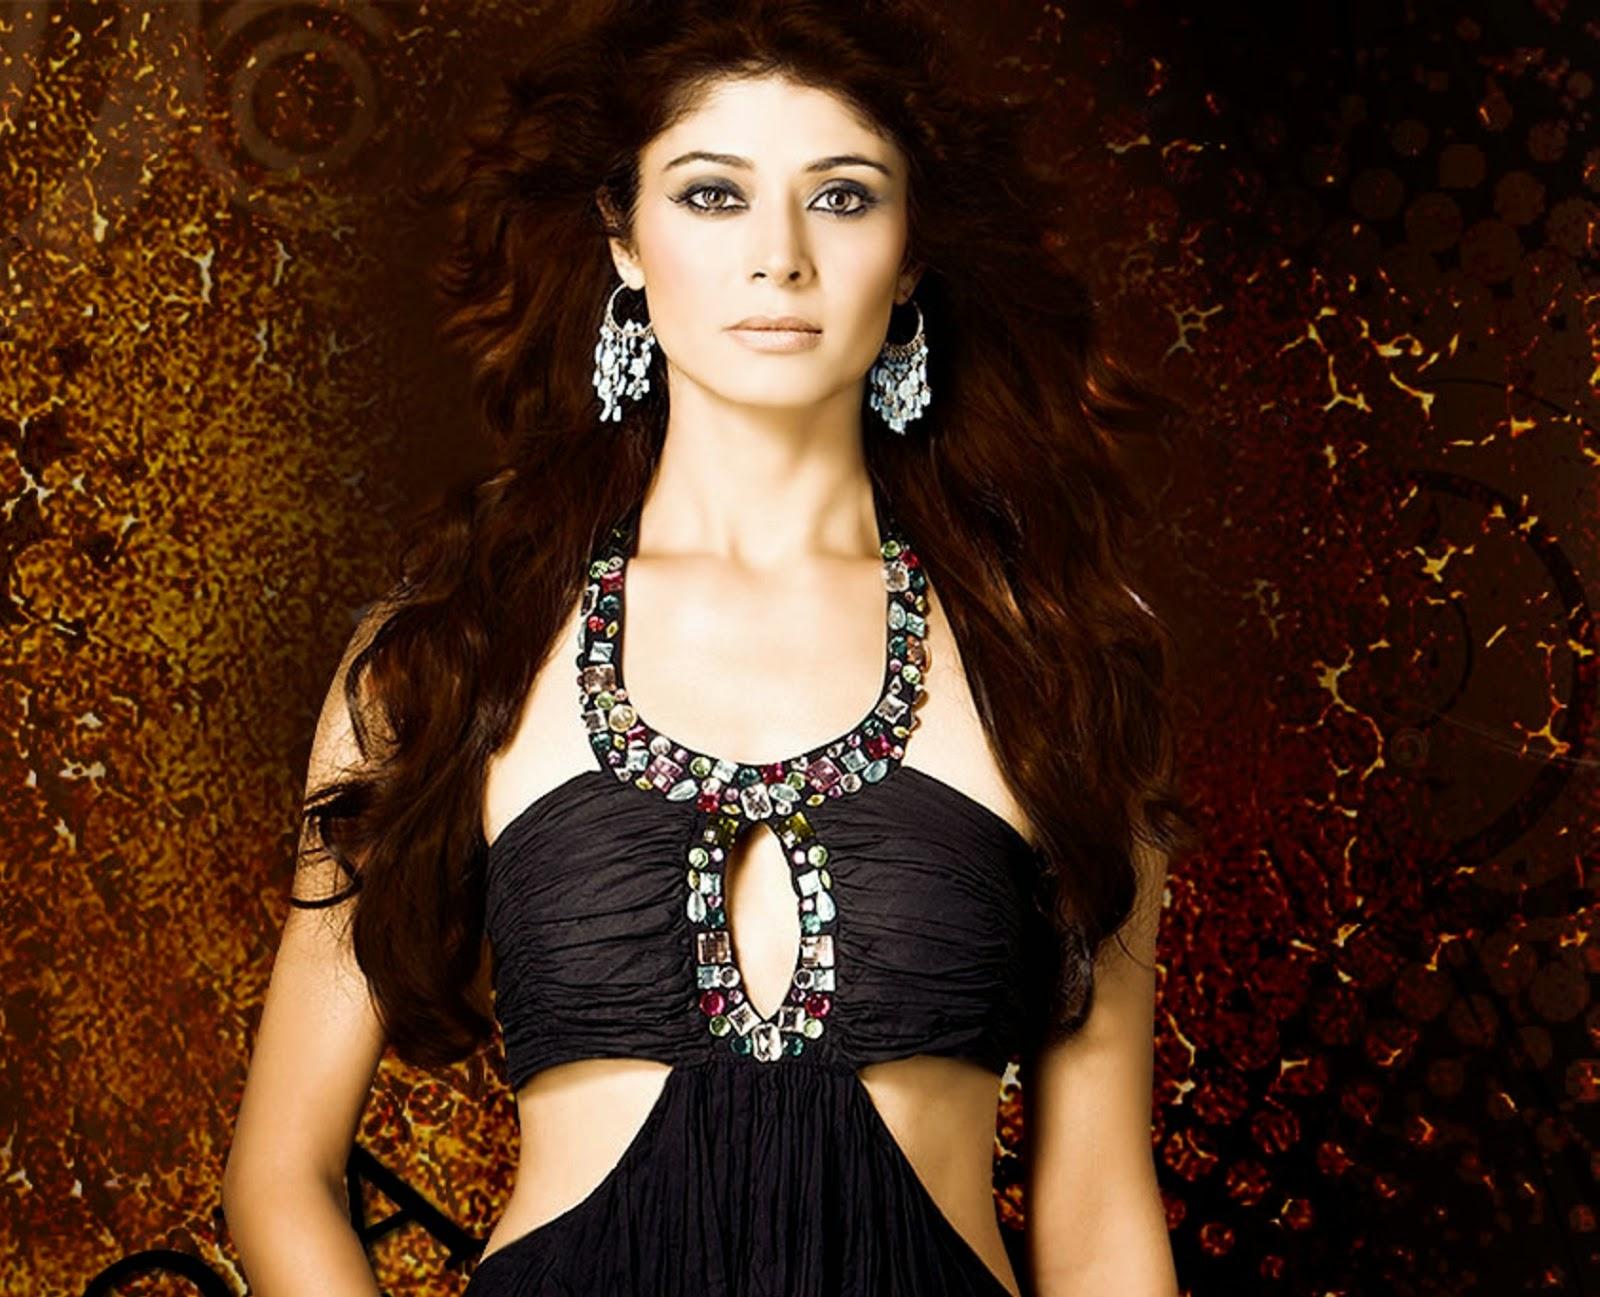 Pooja Batra Actress photo,image,pics and stills - # 295044